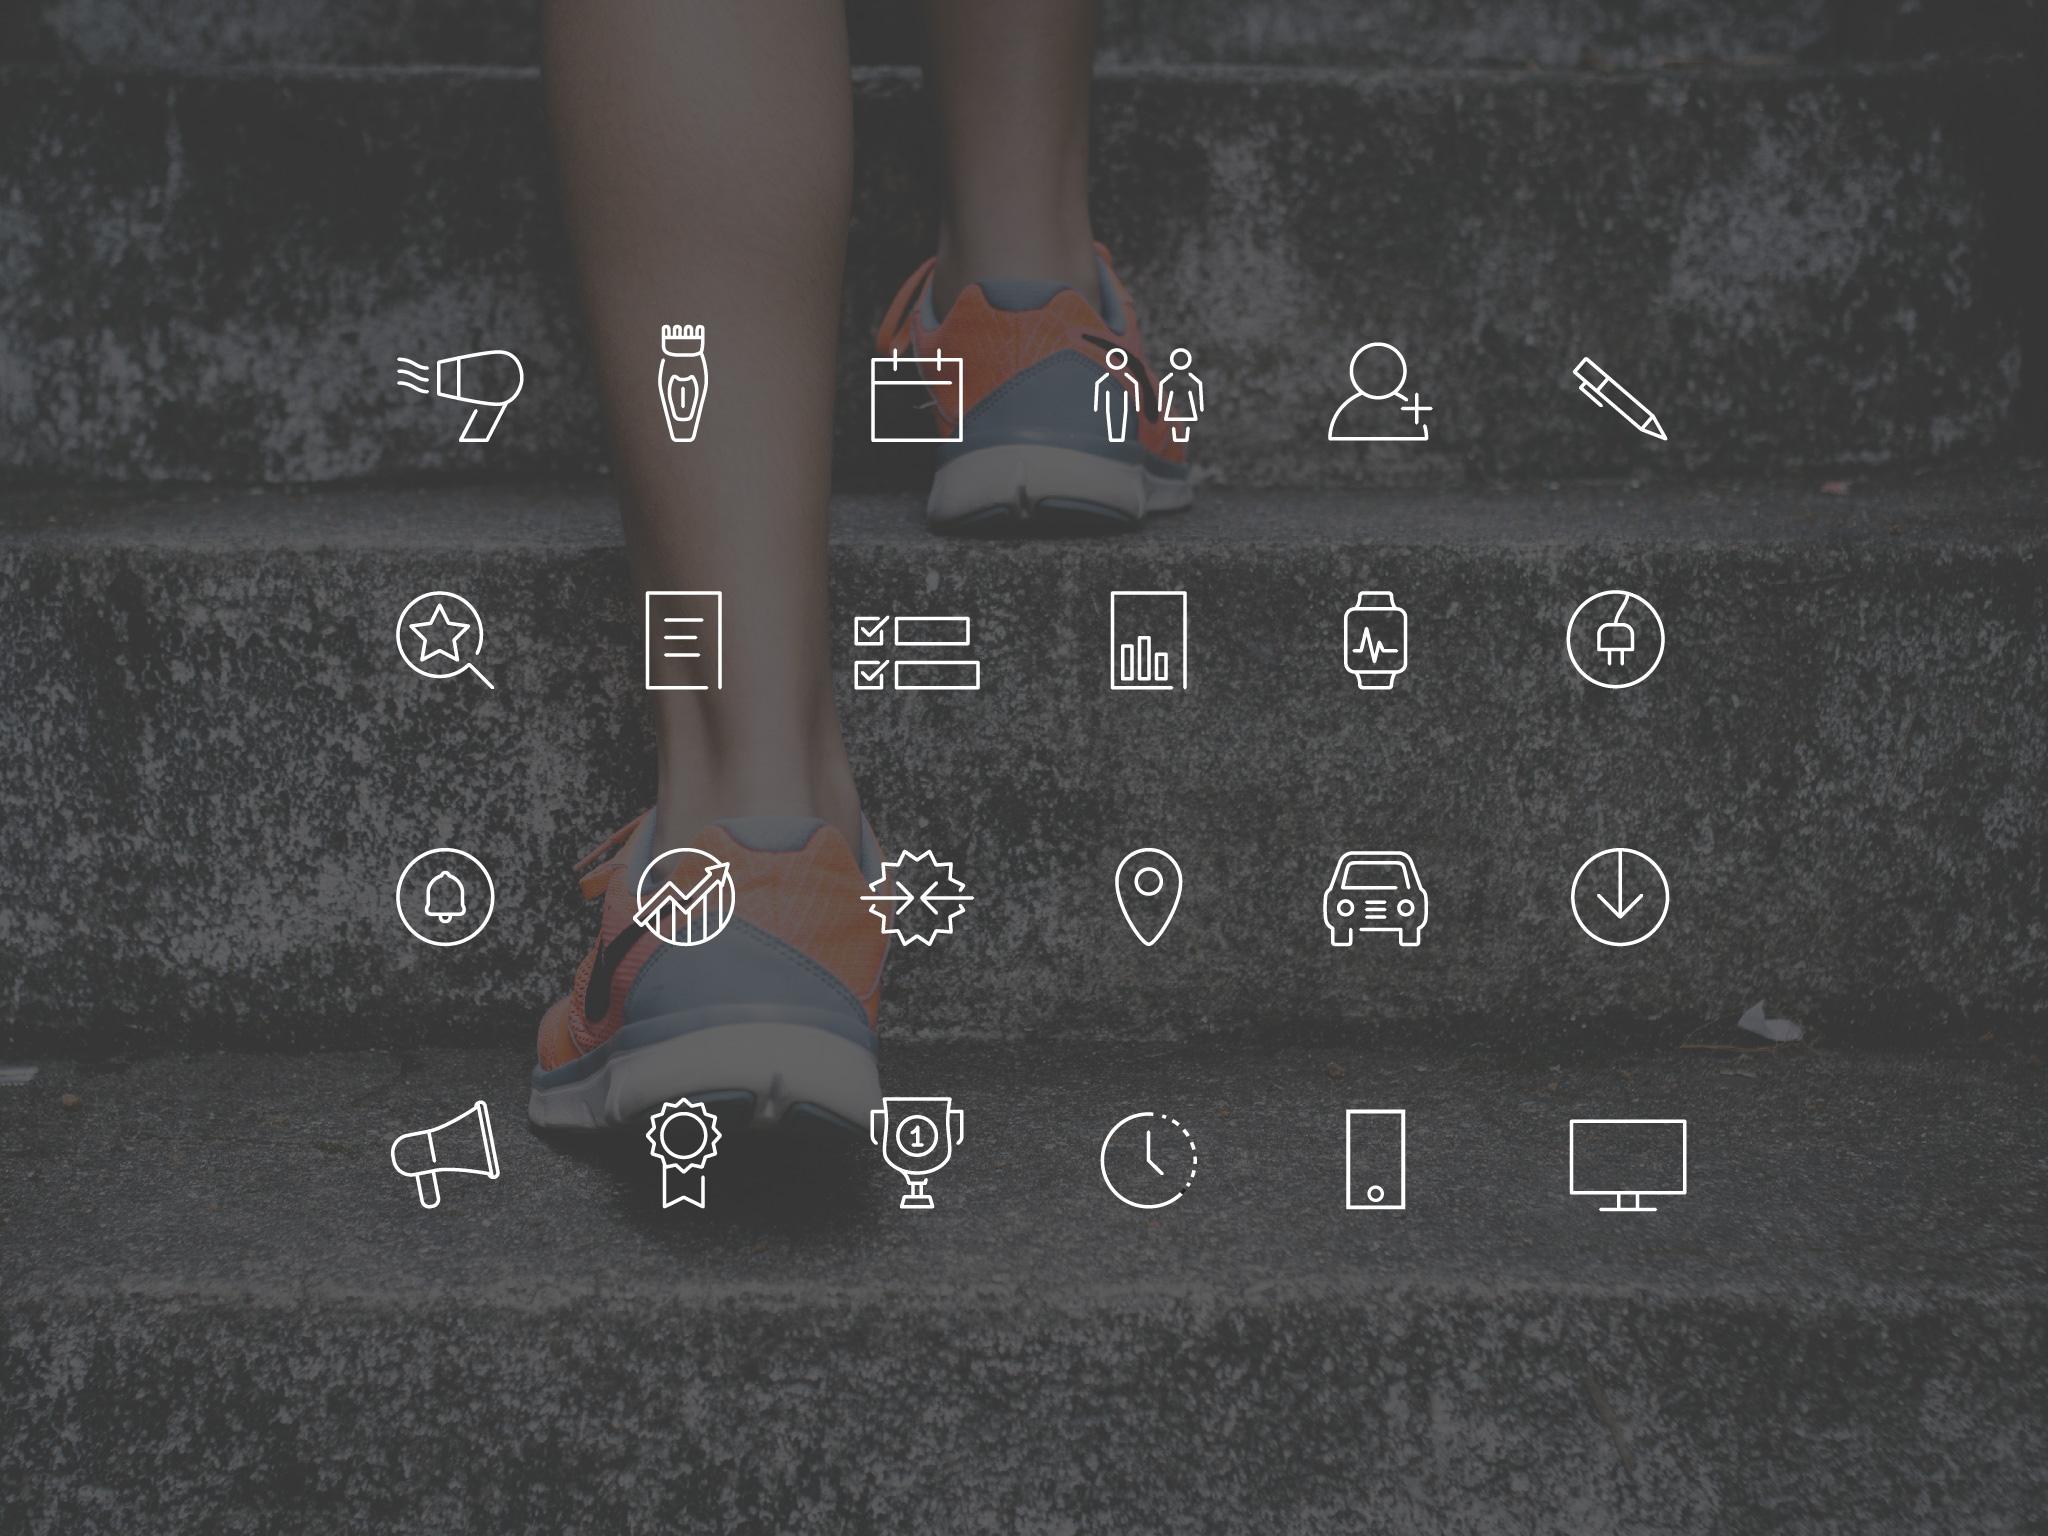 hmd-icons-01.jpg